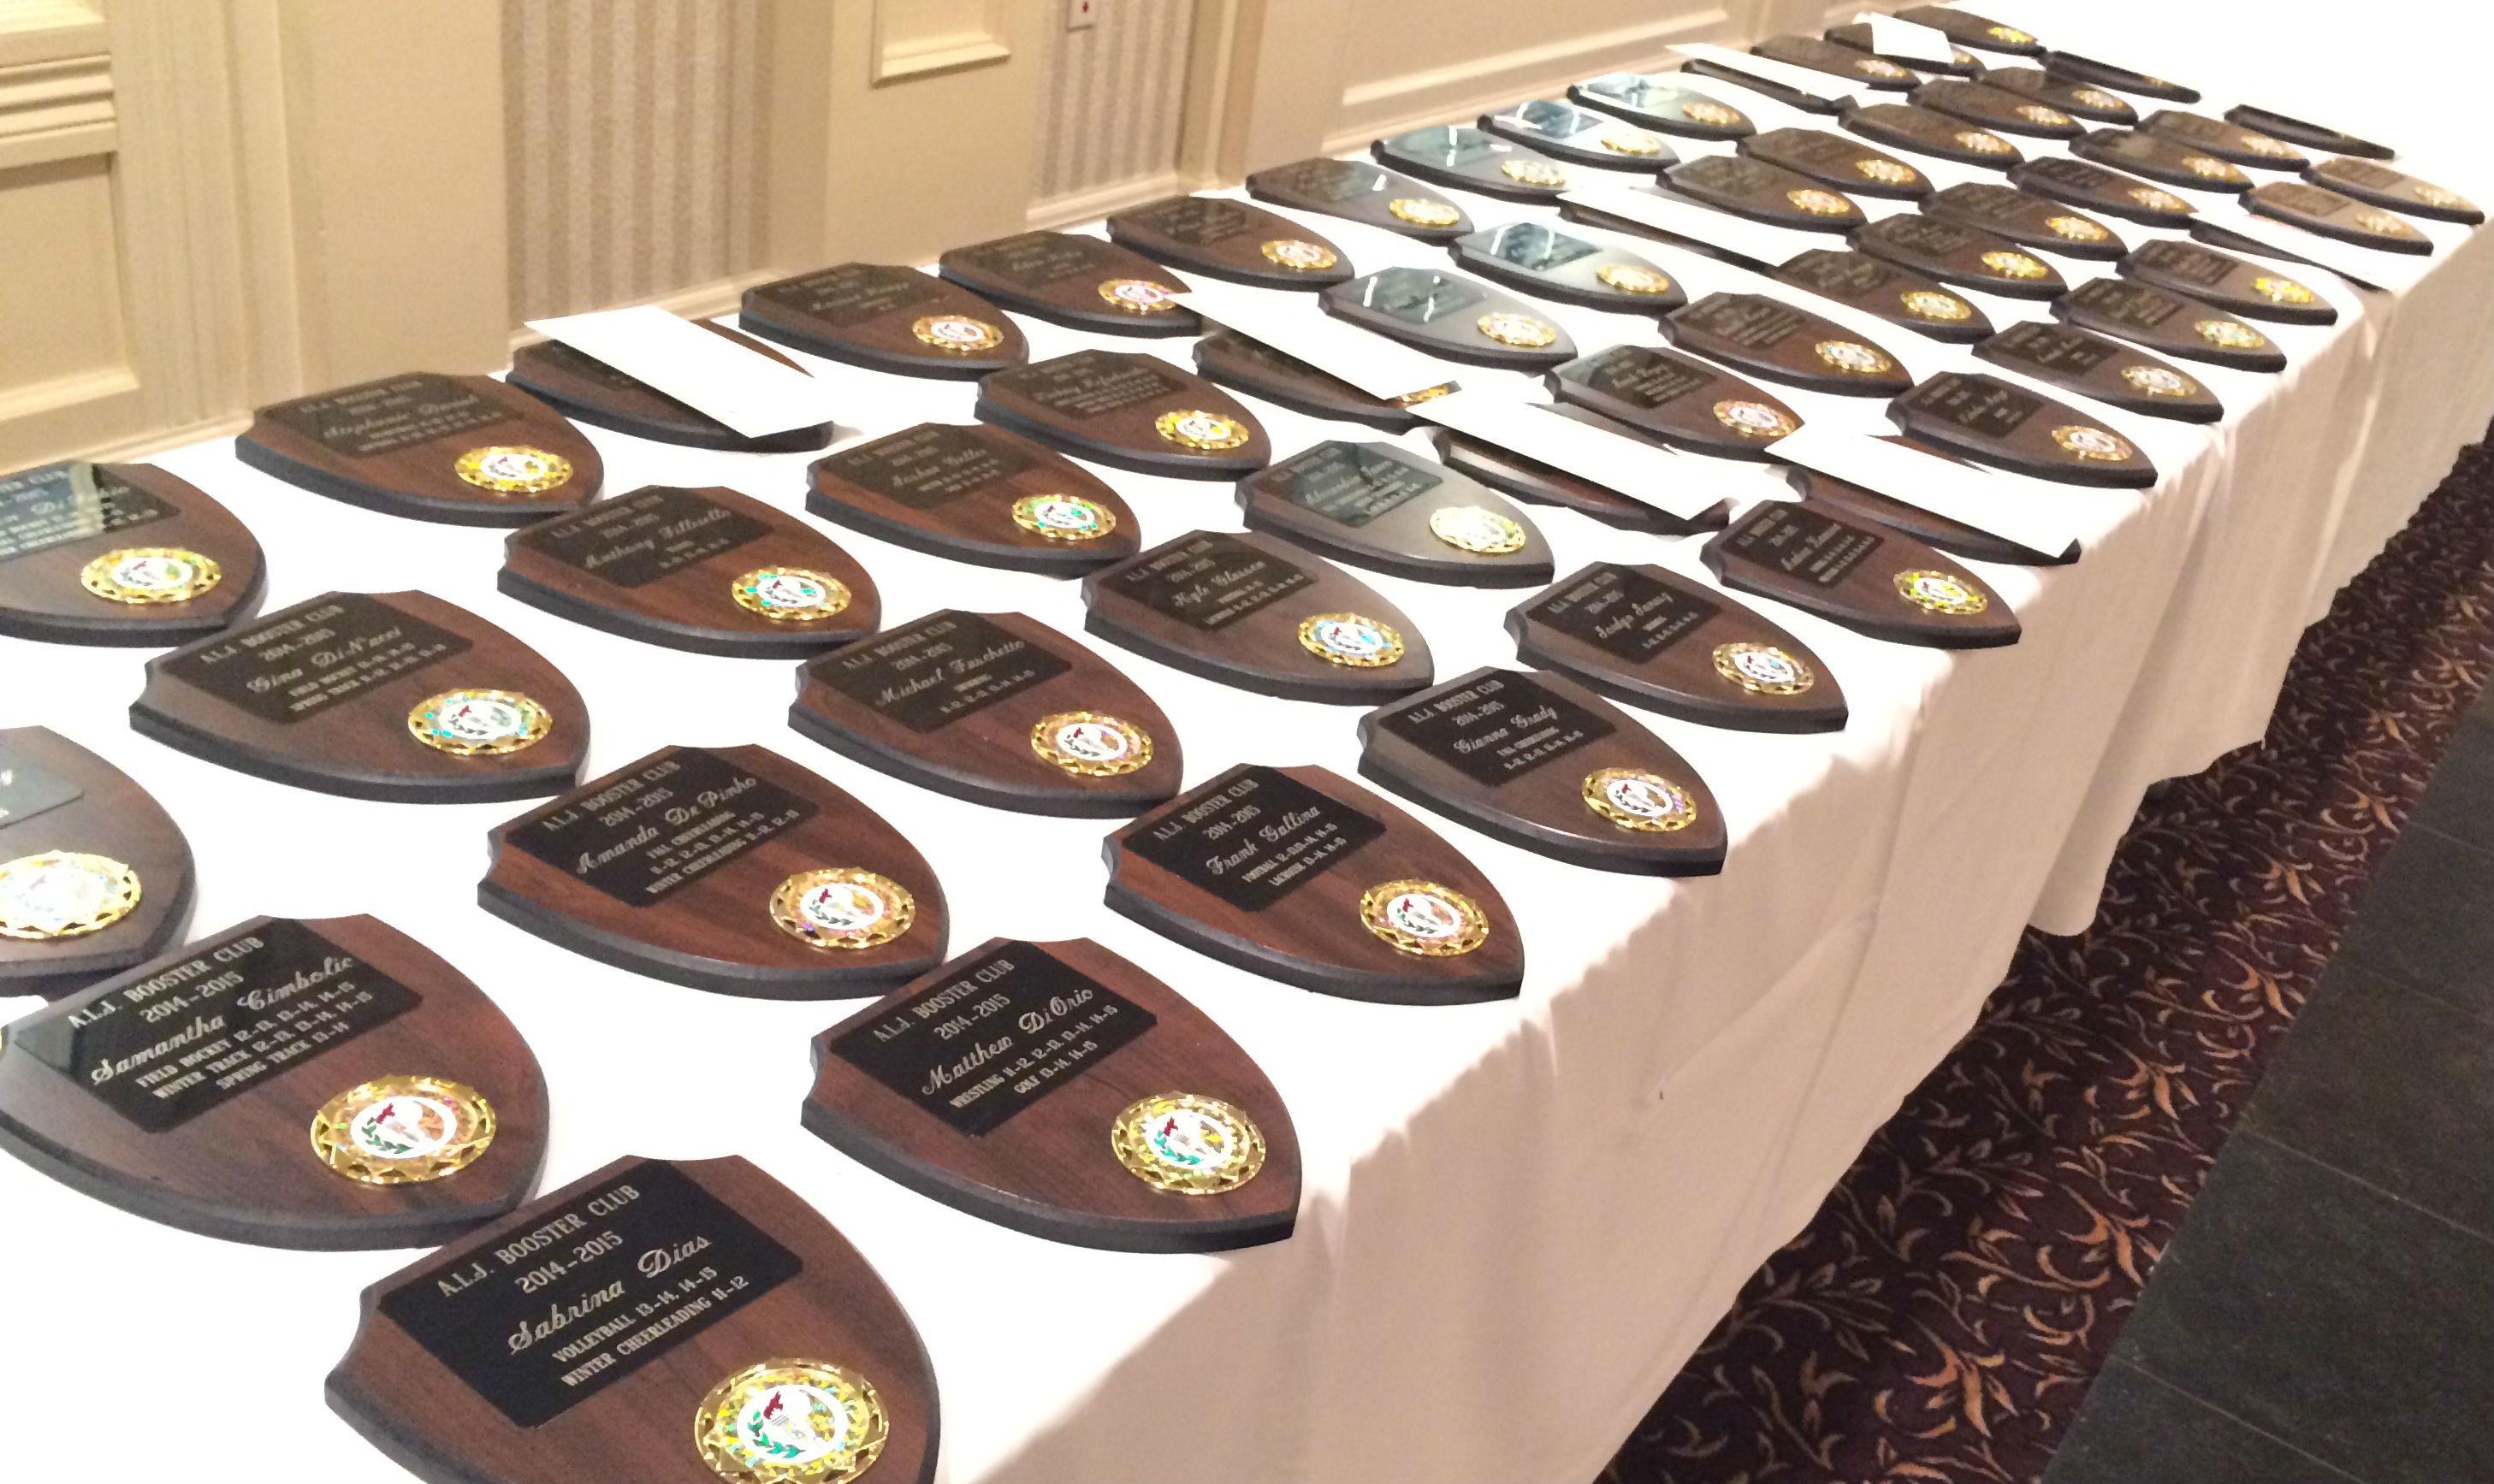 d75397d6cadb33e93e3e_Senior_Sports_Awards_D.jpg